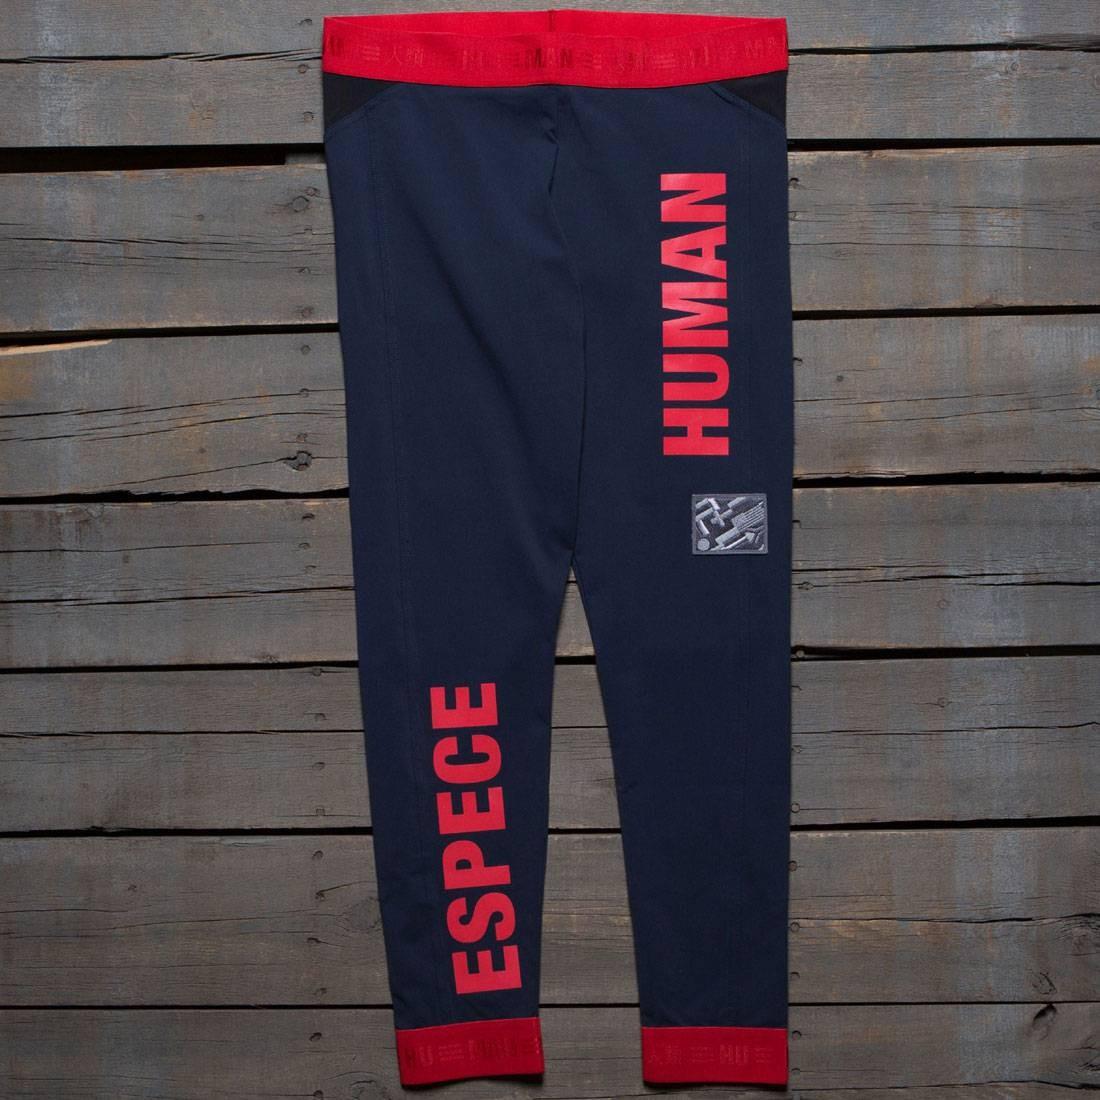 593e606dbf9f3 Adidas x Pharrell Williams Women Hu Race Leggings navy night marine scarlet